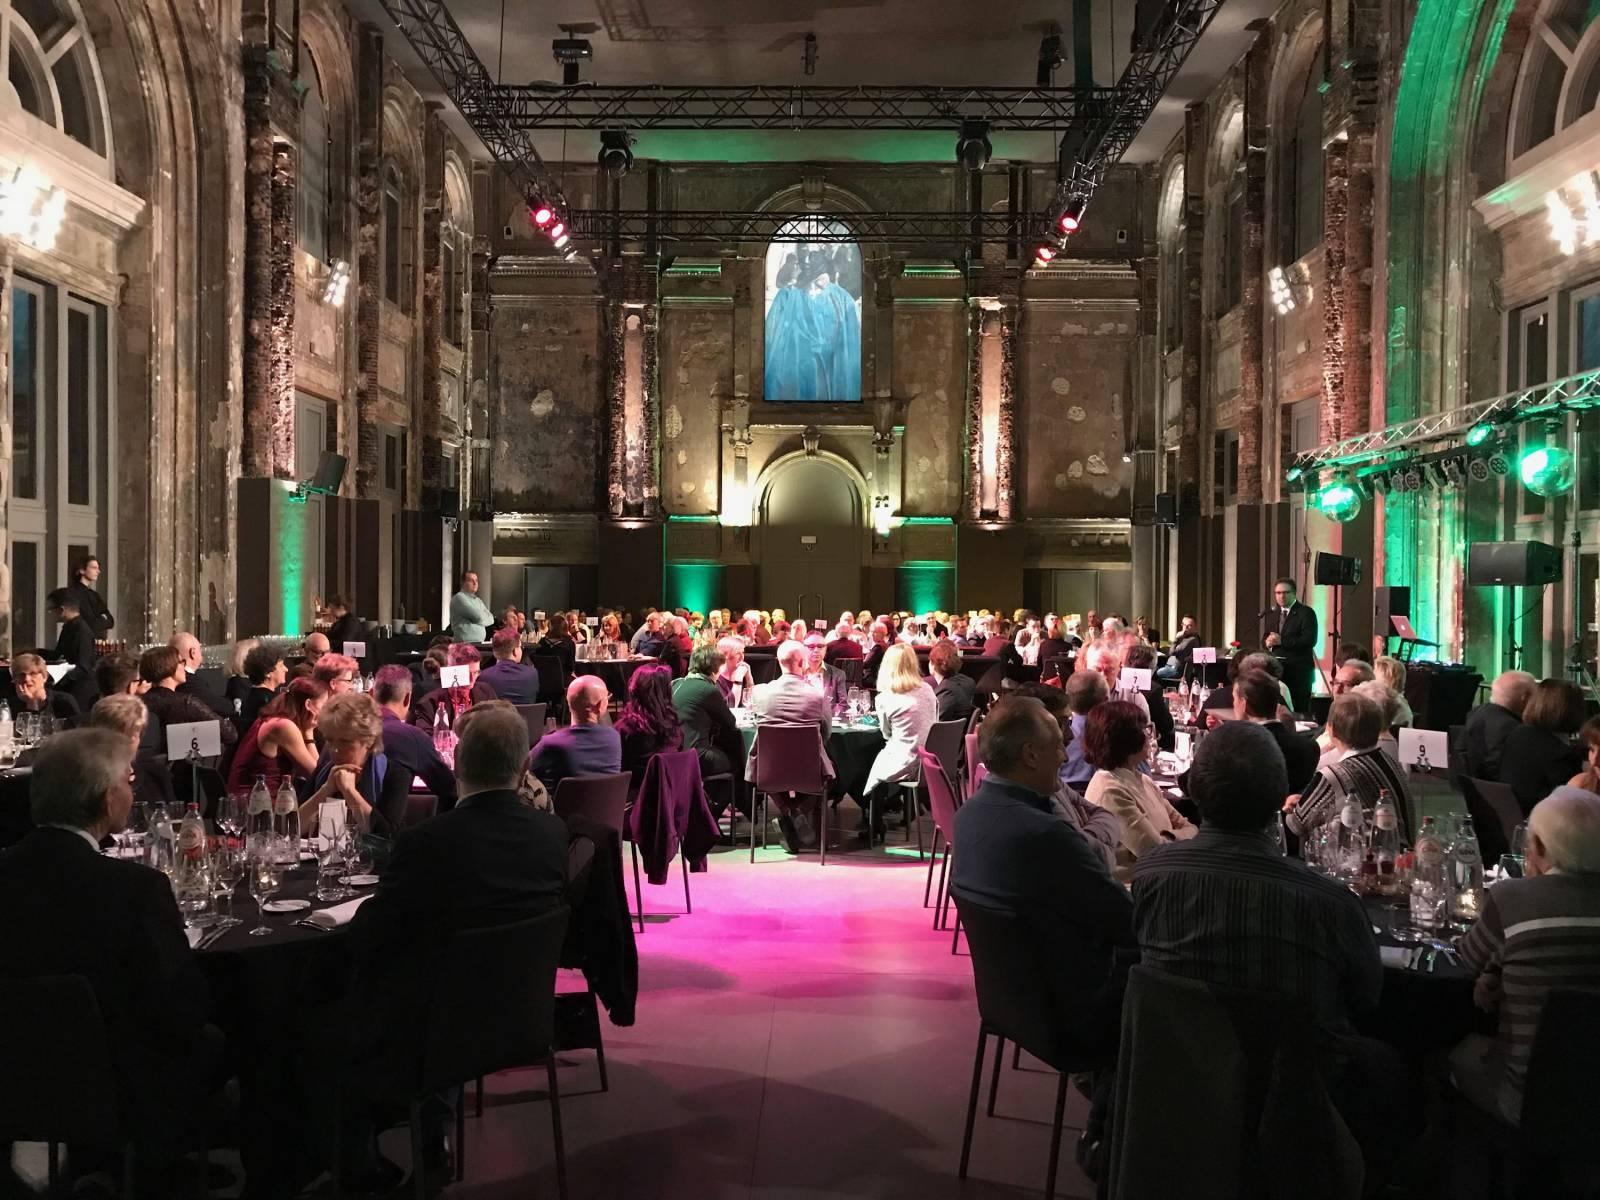 Zaal AthenA - Feestzaal - Trouwzaal - Antwerpen - House of Weddings - 30